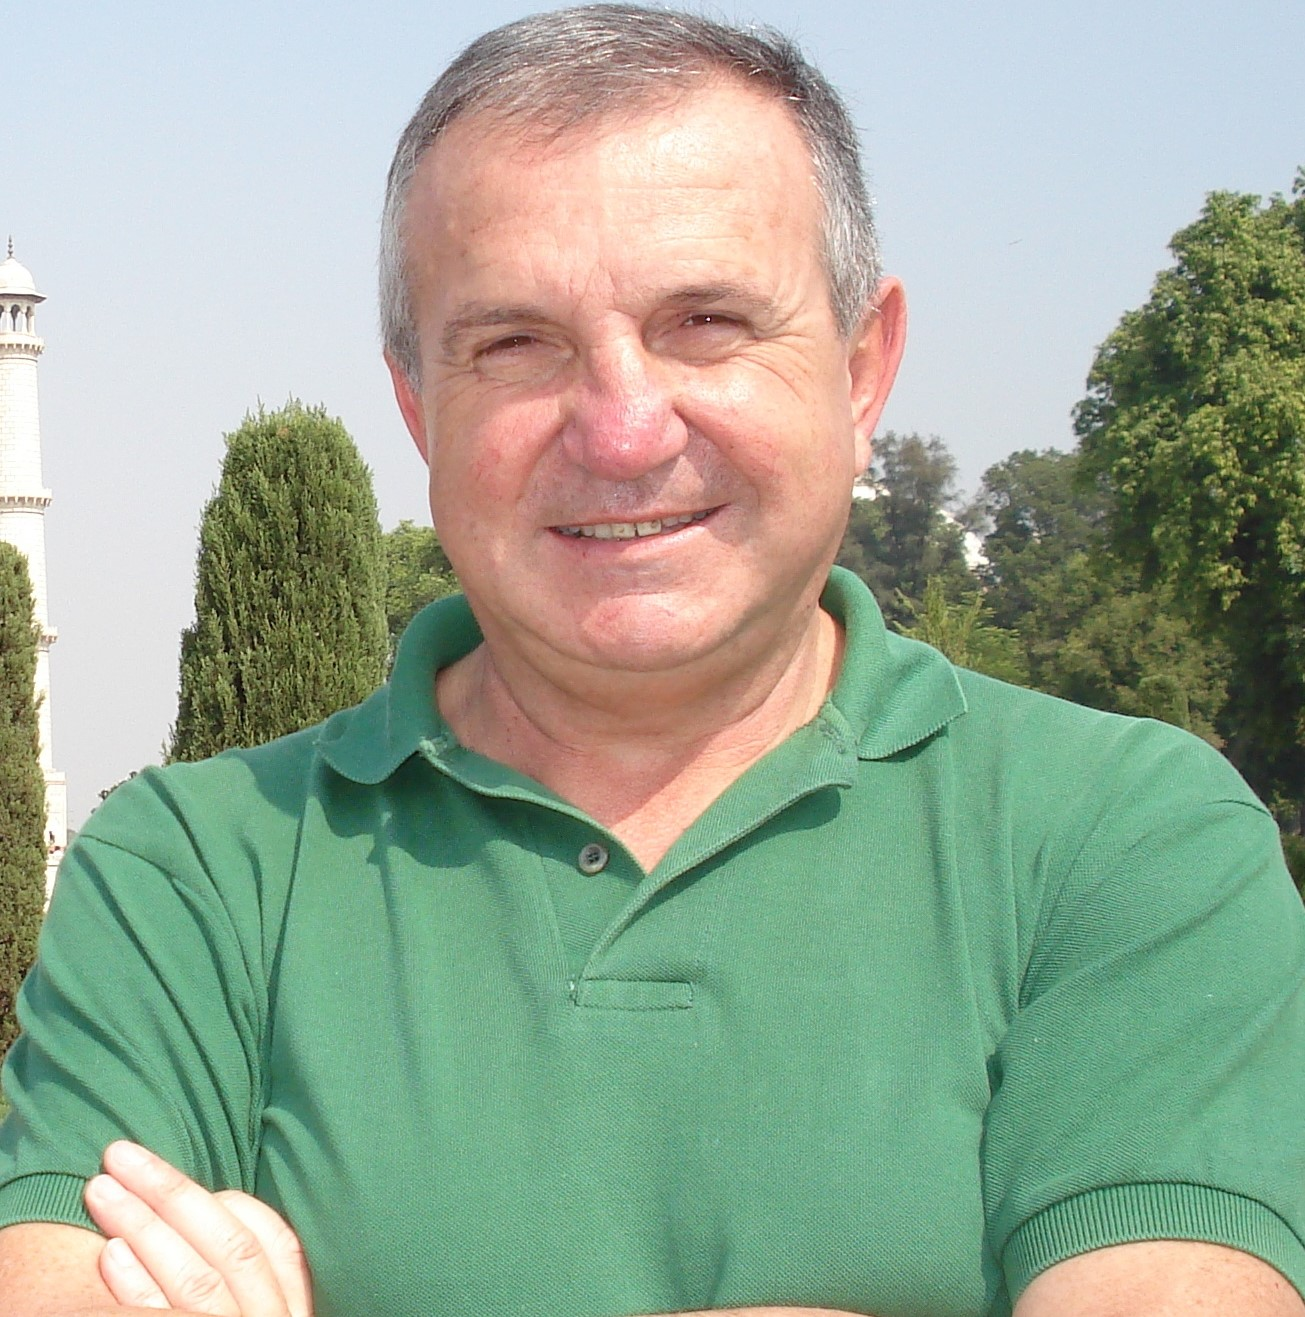 Gianni Mori